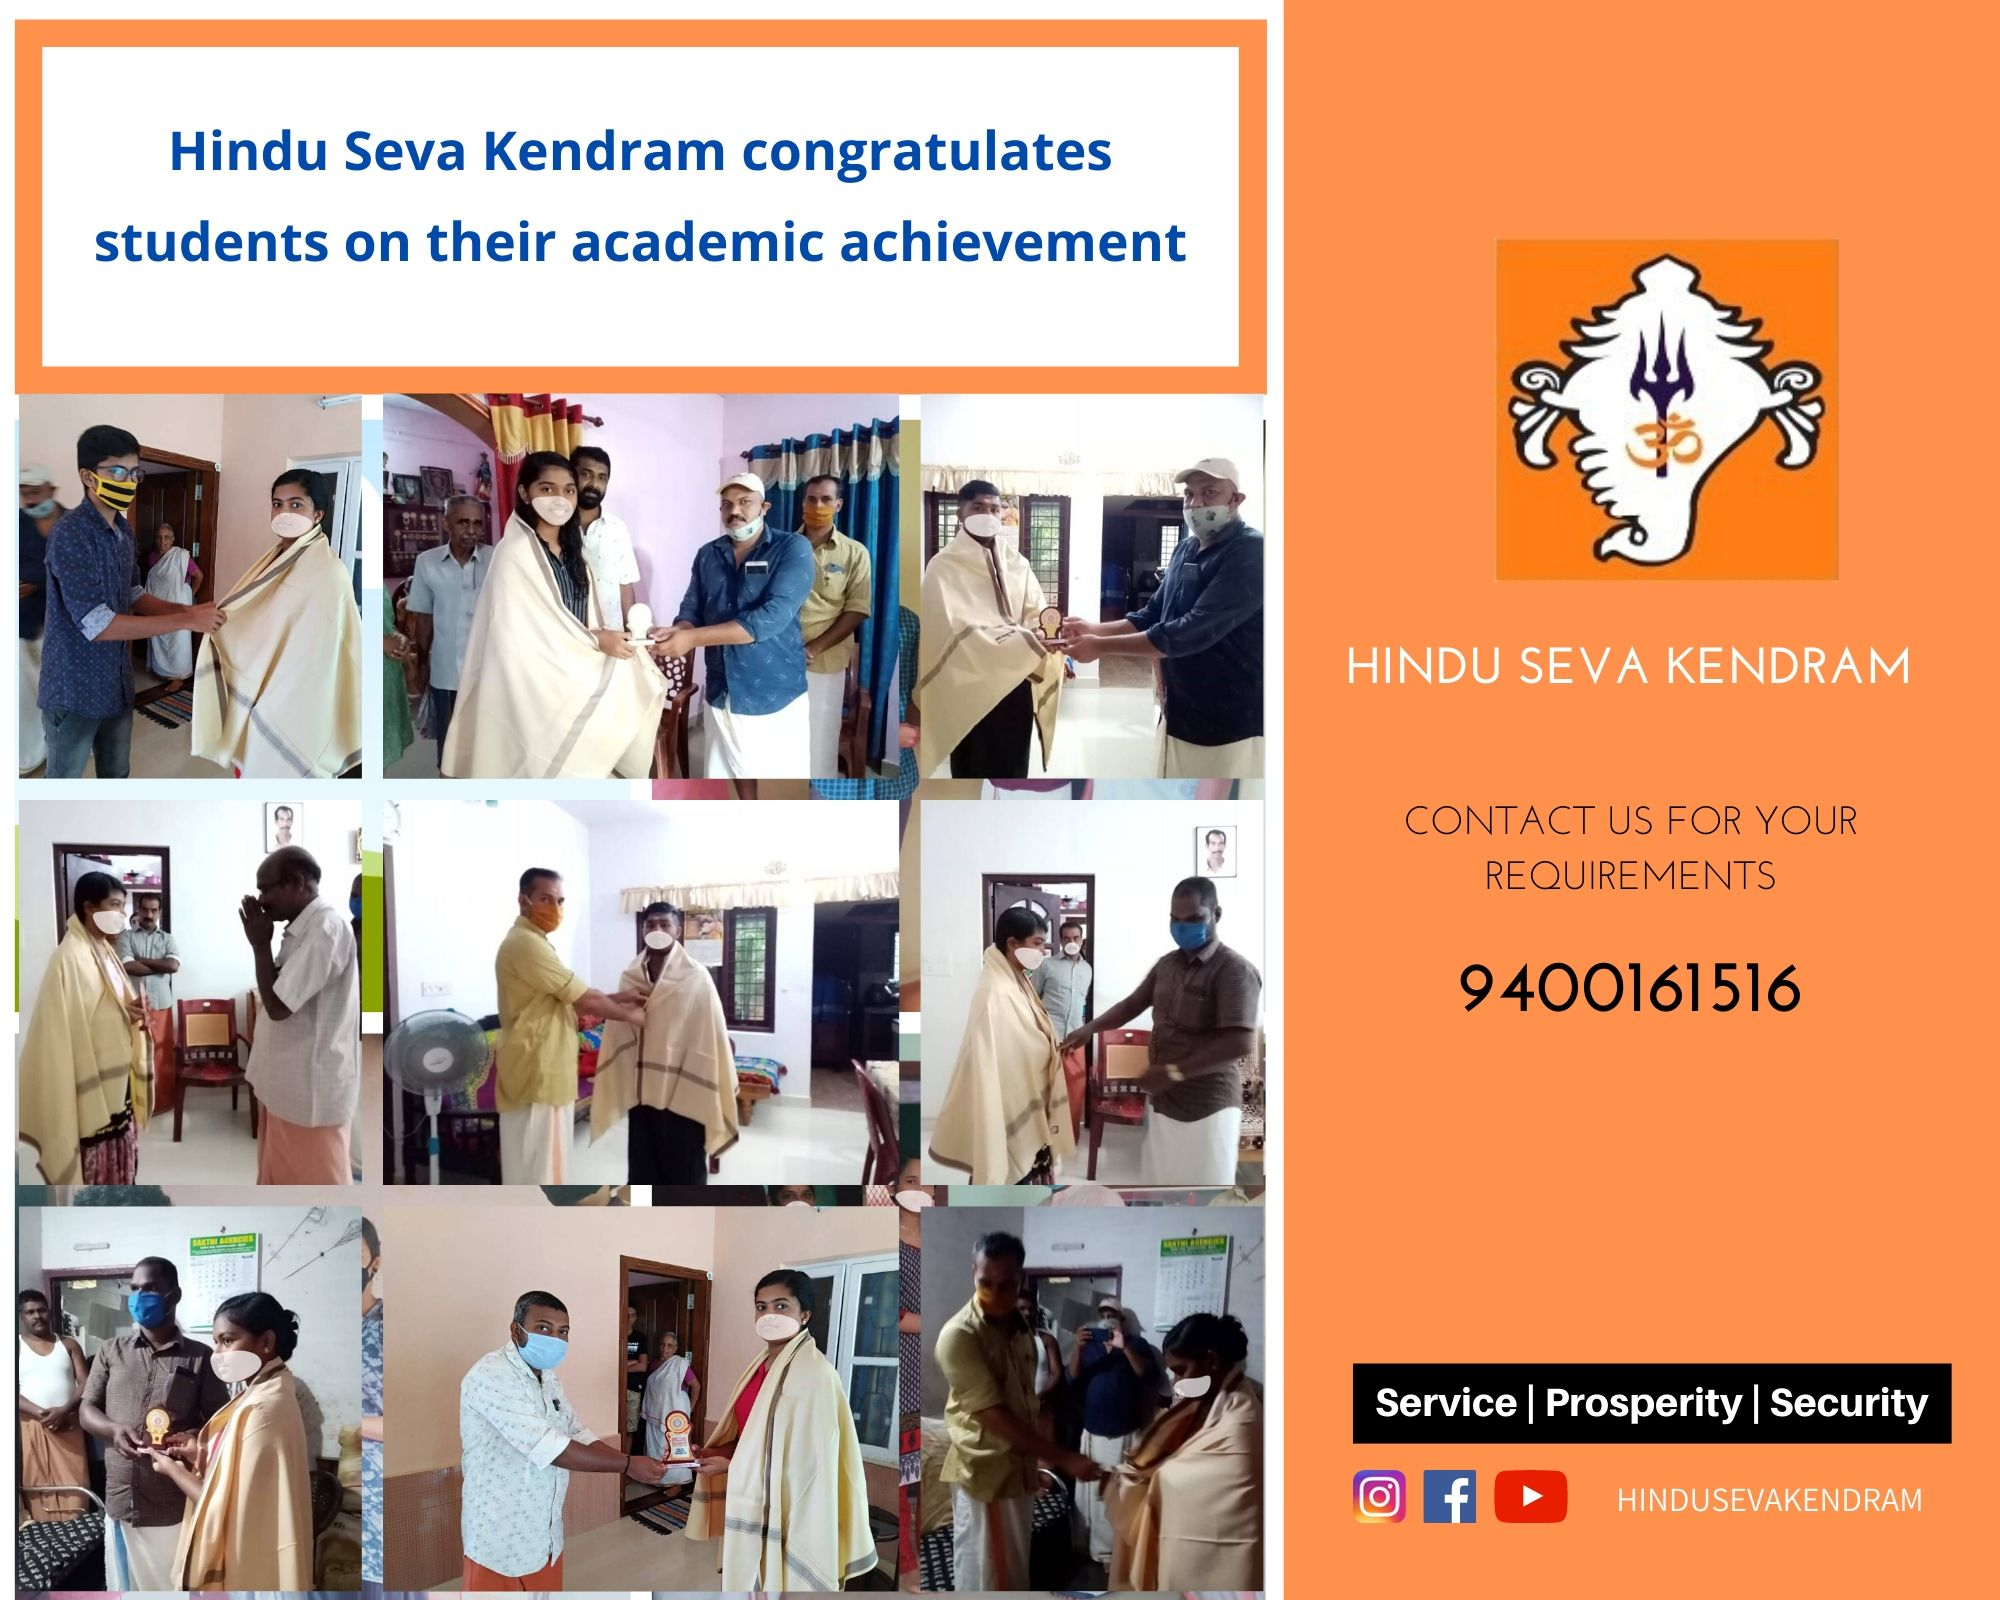 Hindu Seva Kendram congratulates students on their academic achievement